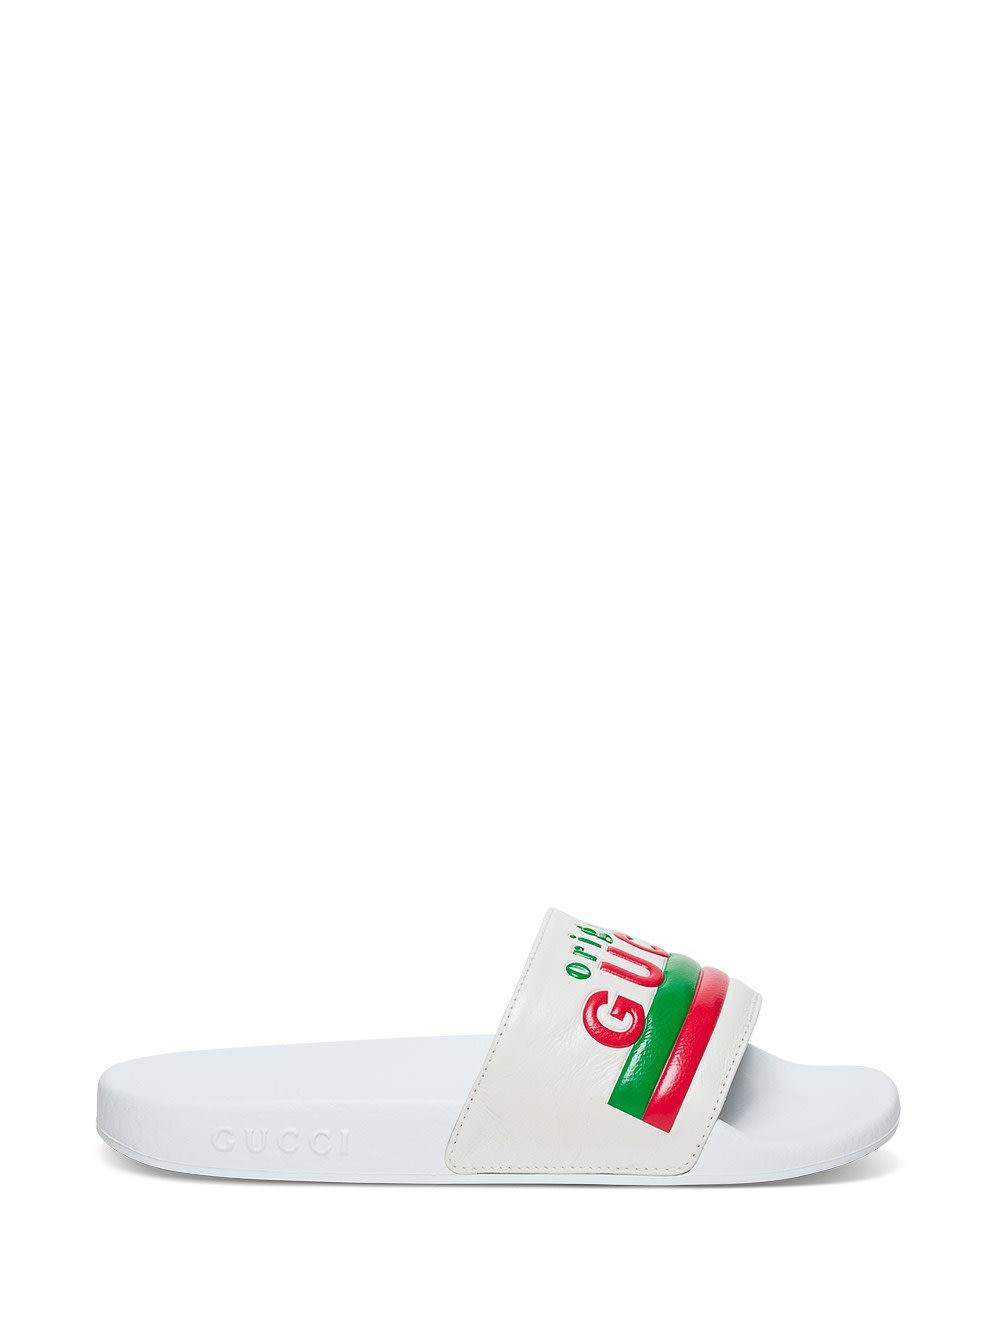 Gucci Slide Original Leather Sandals With Logo